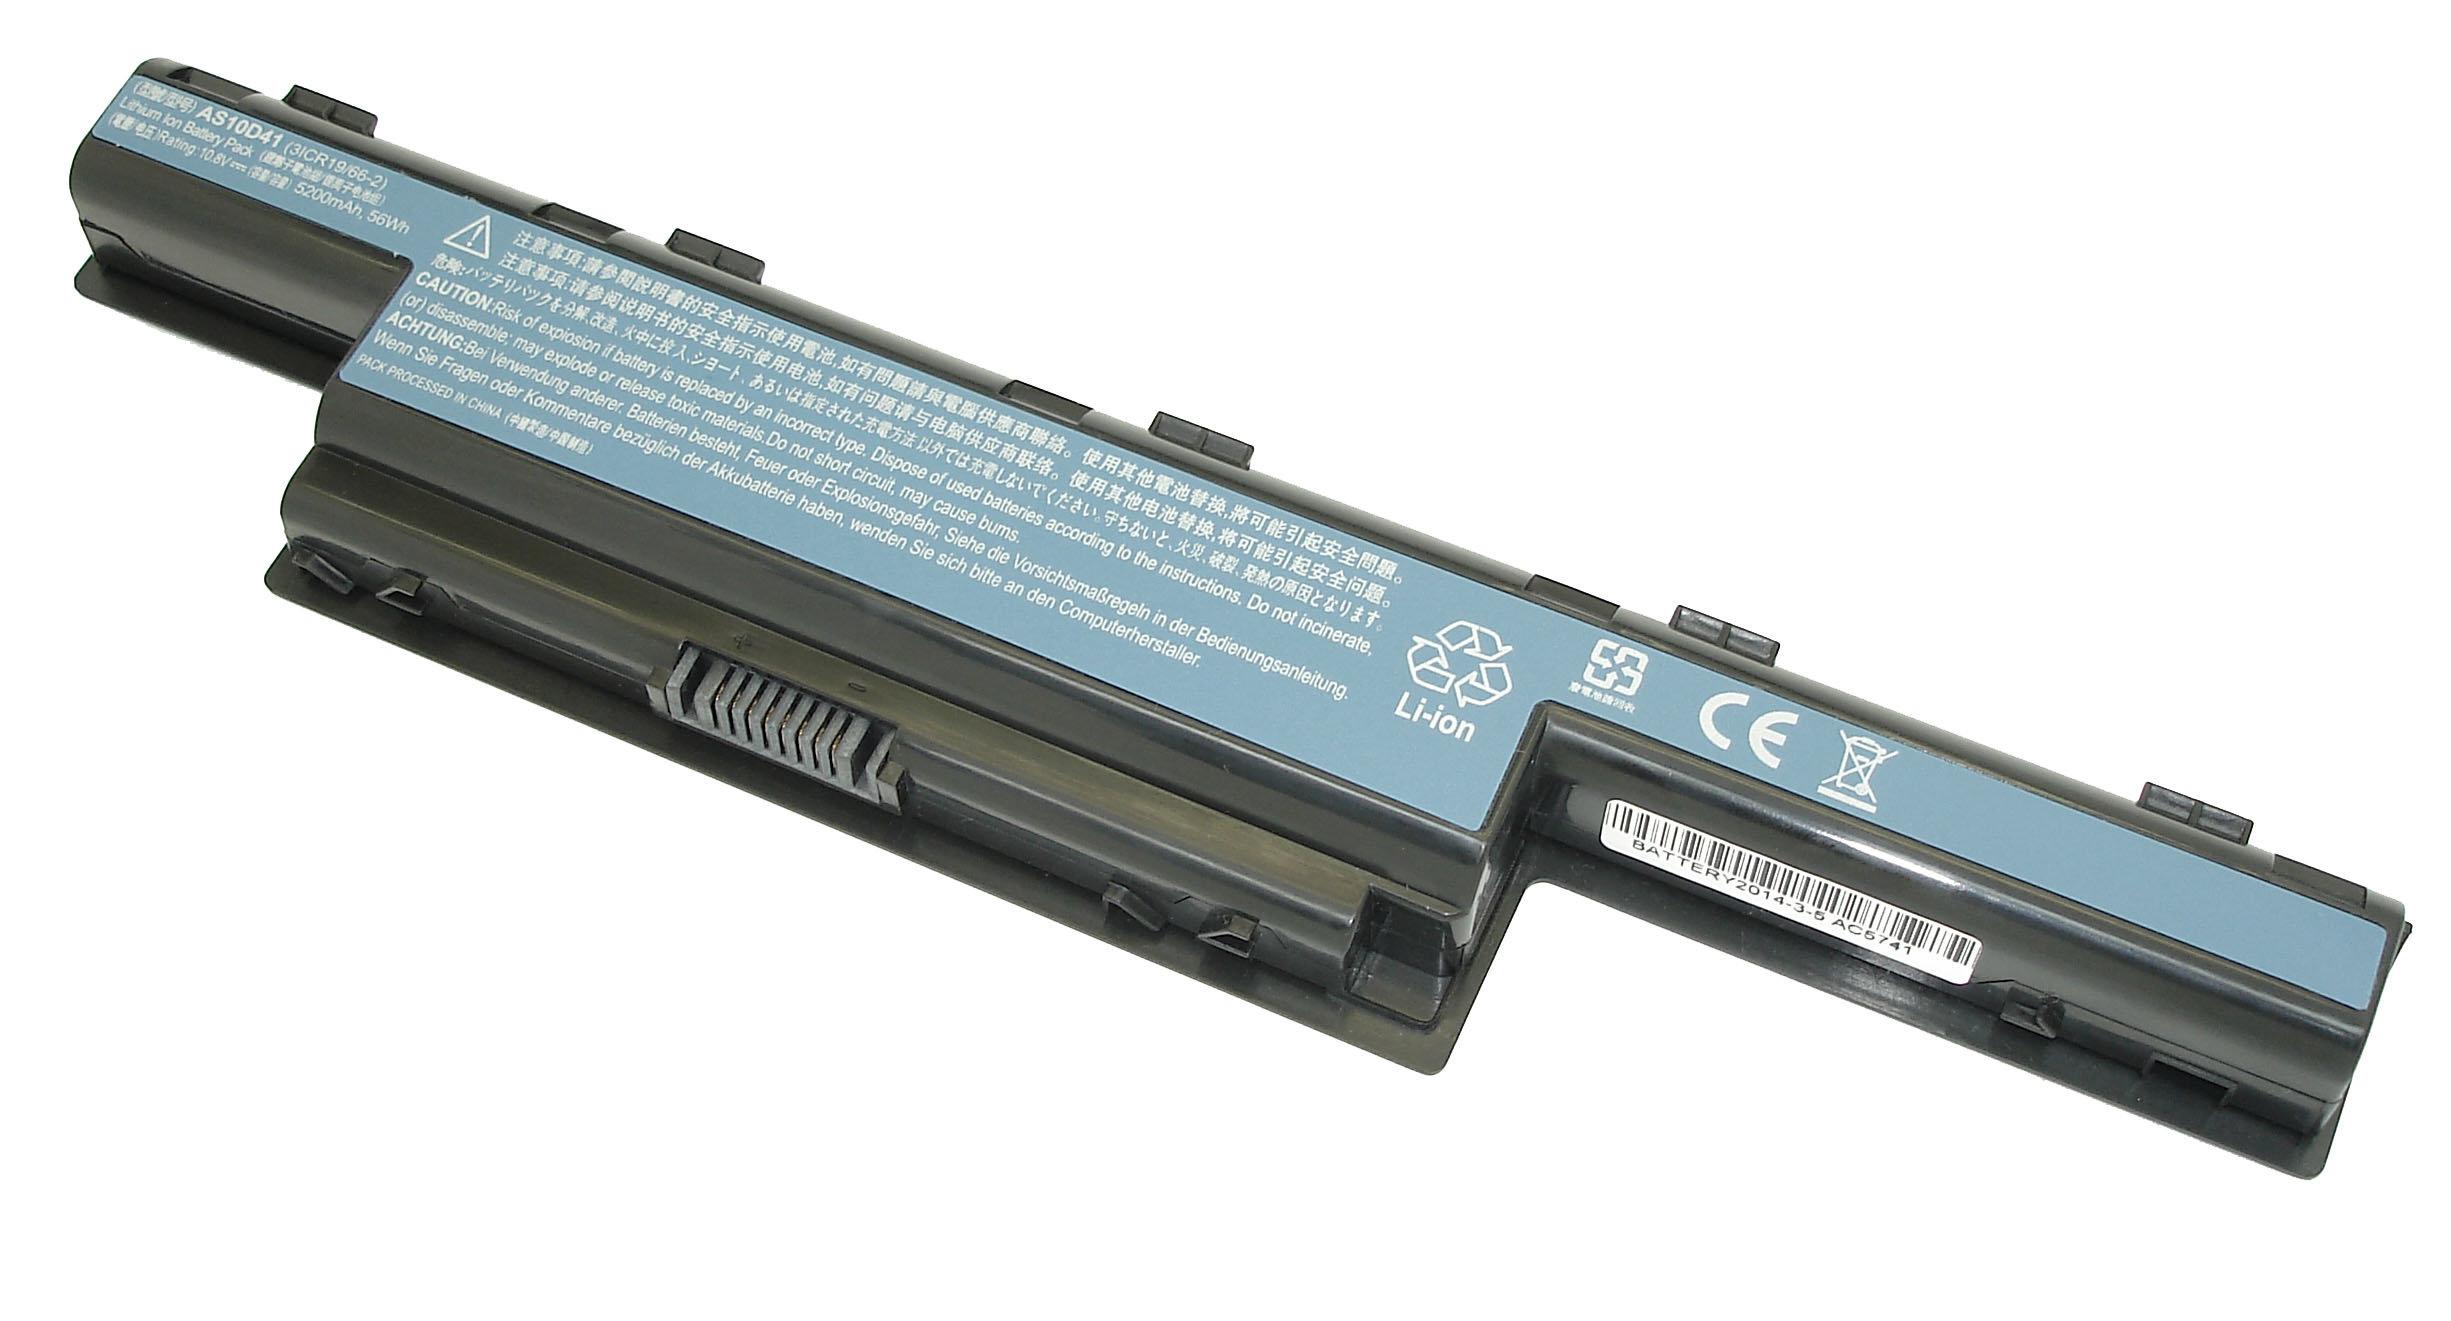 Аккумуляторная батарея для ноутбука Acer Aspire 5741, 5733, 4551, 4741, 4740, 4771 5551 серий